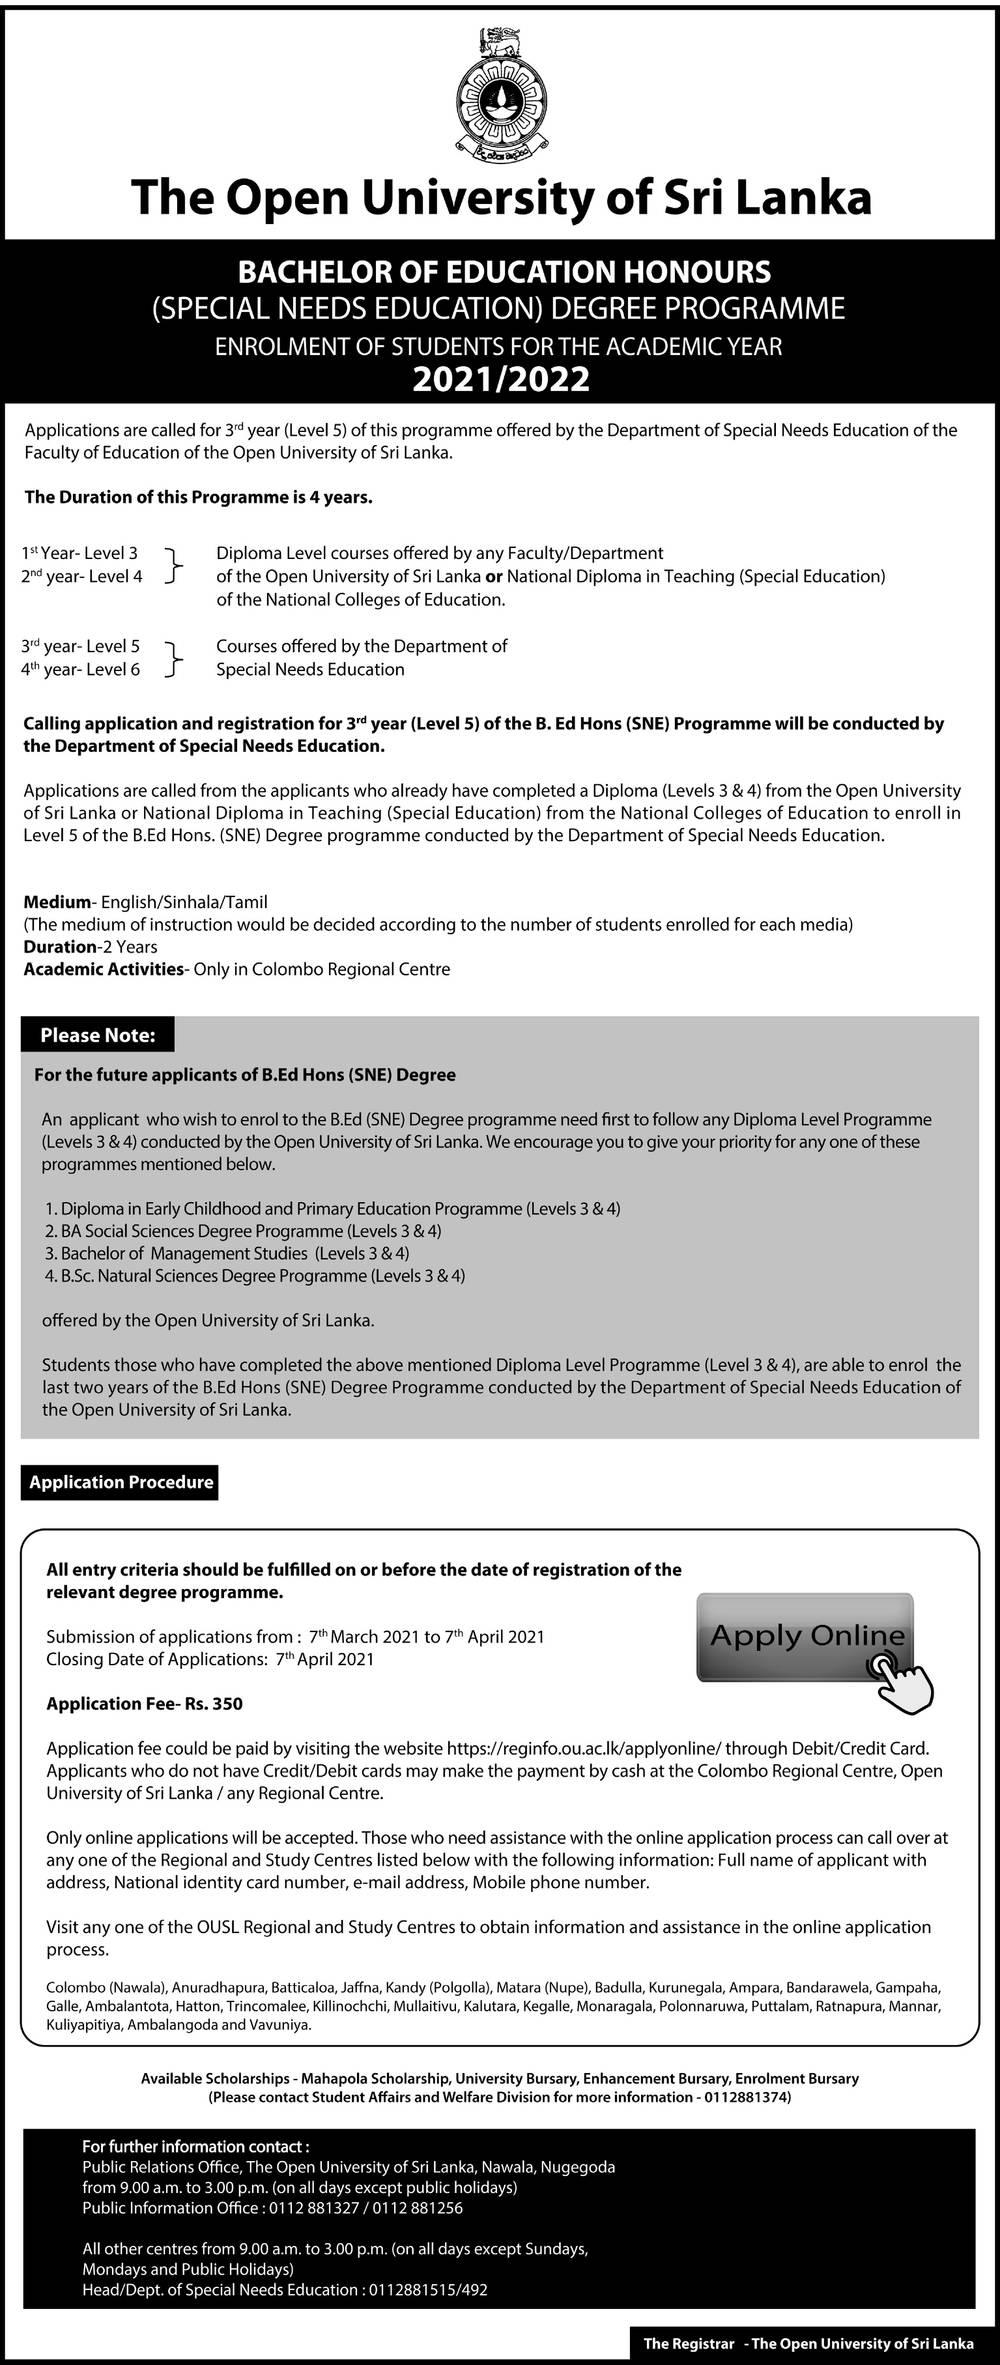 Bachelor of Education Honours (Special Needs Education) Degree Programme (2021/2022)- The Open University of Sri Lanka